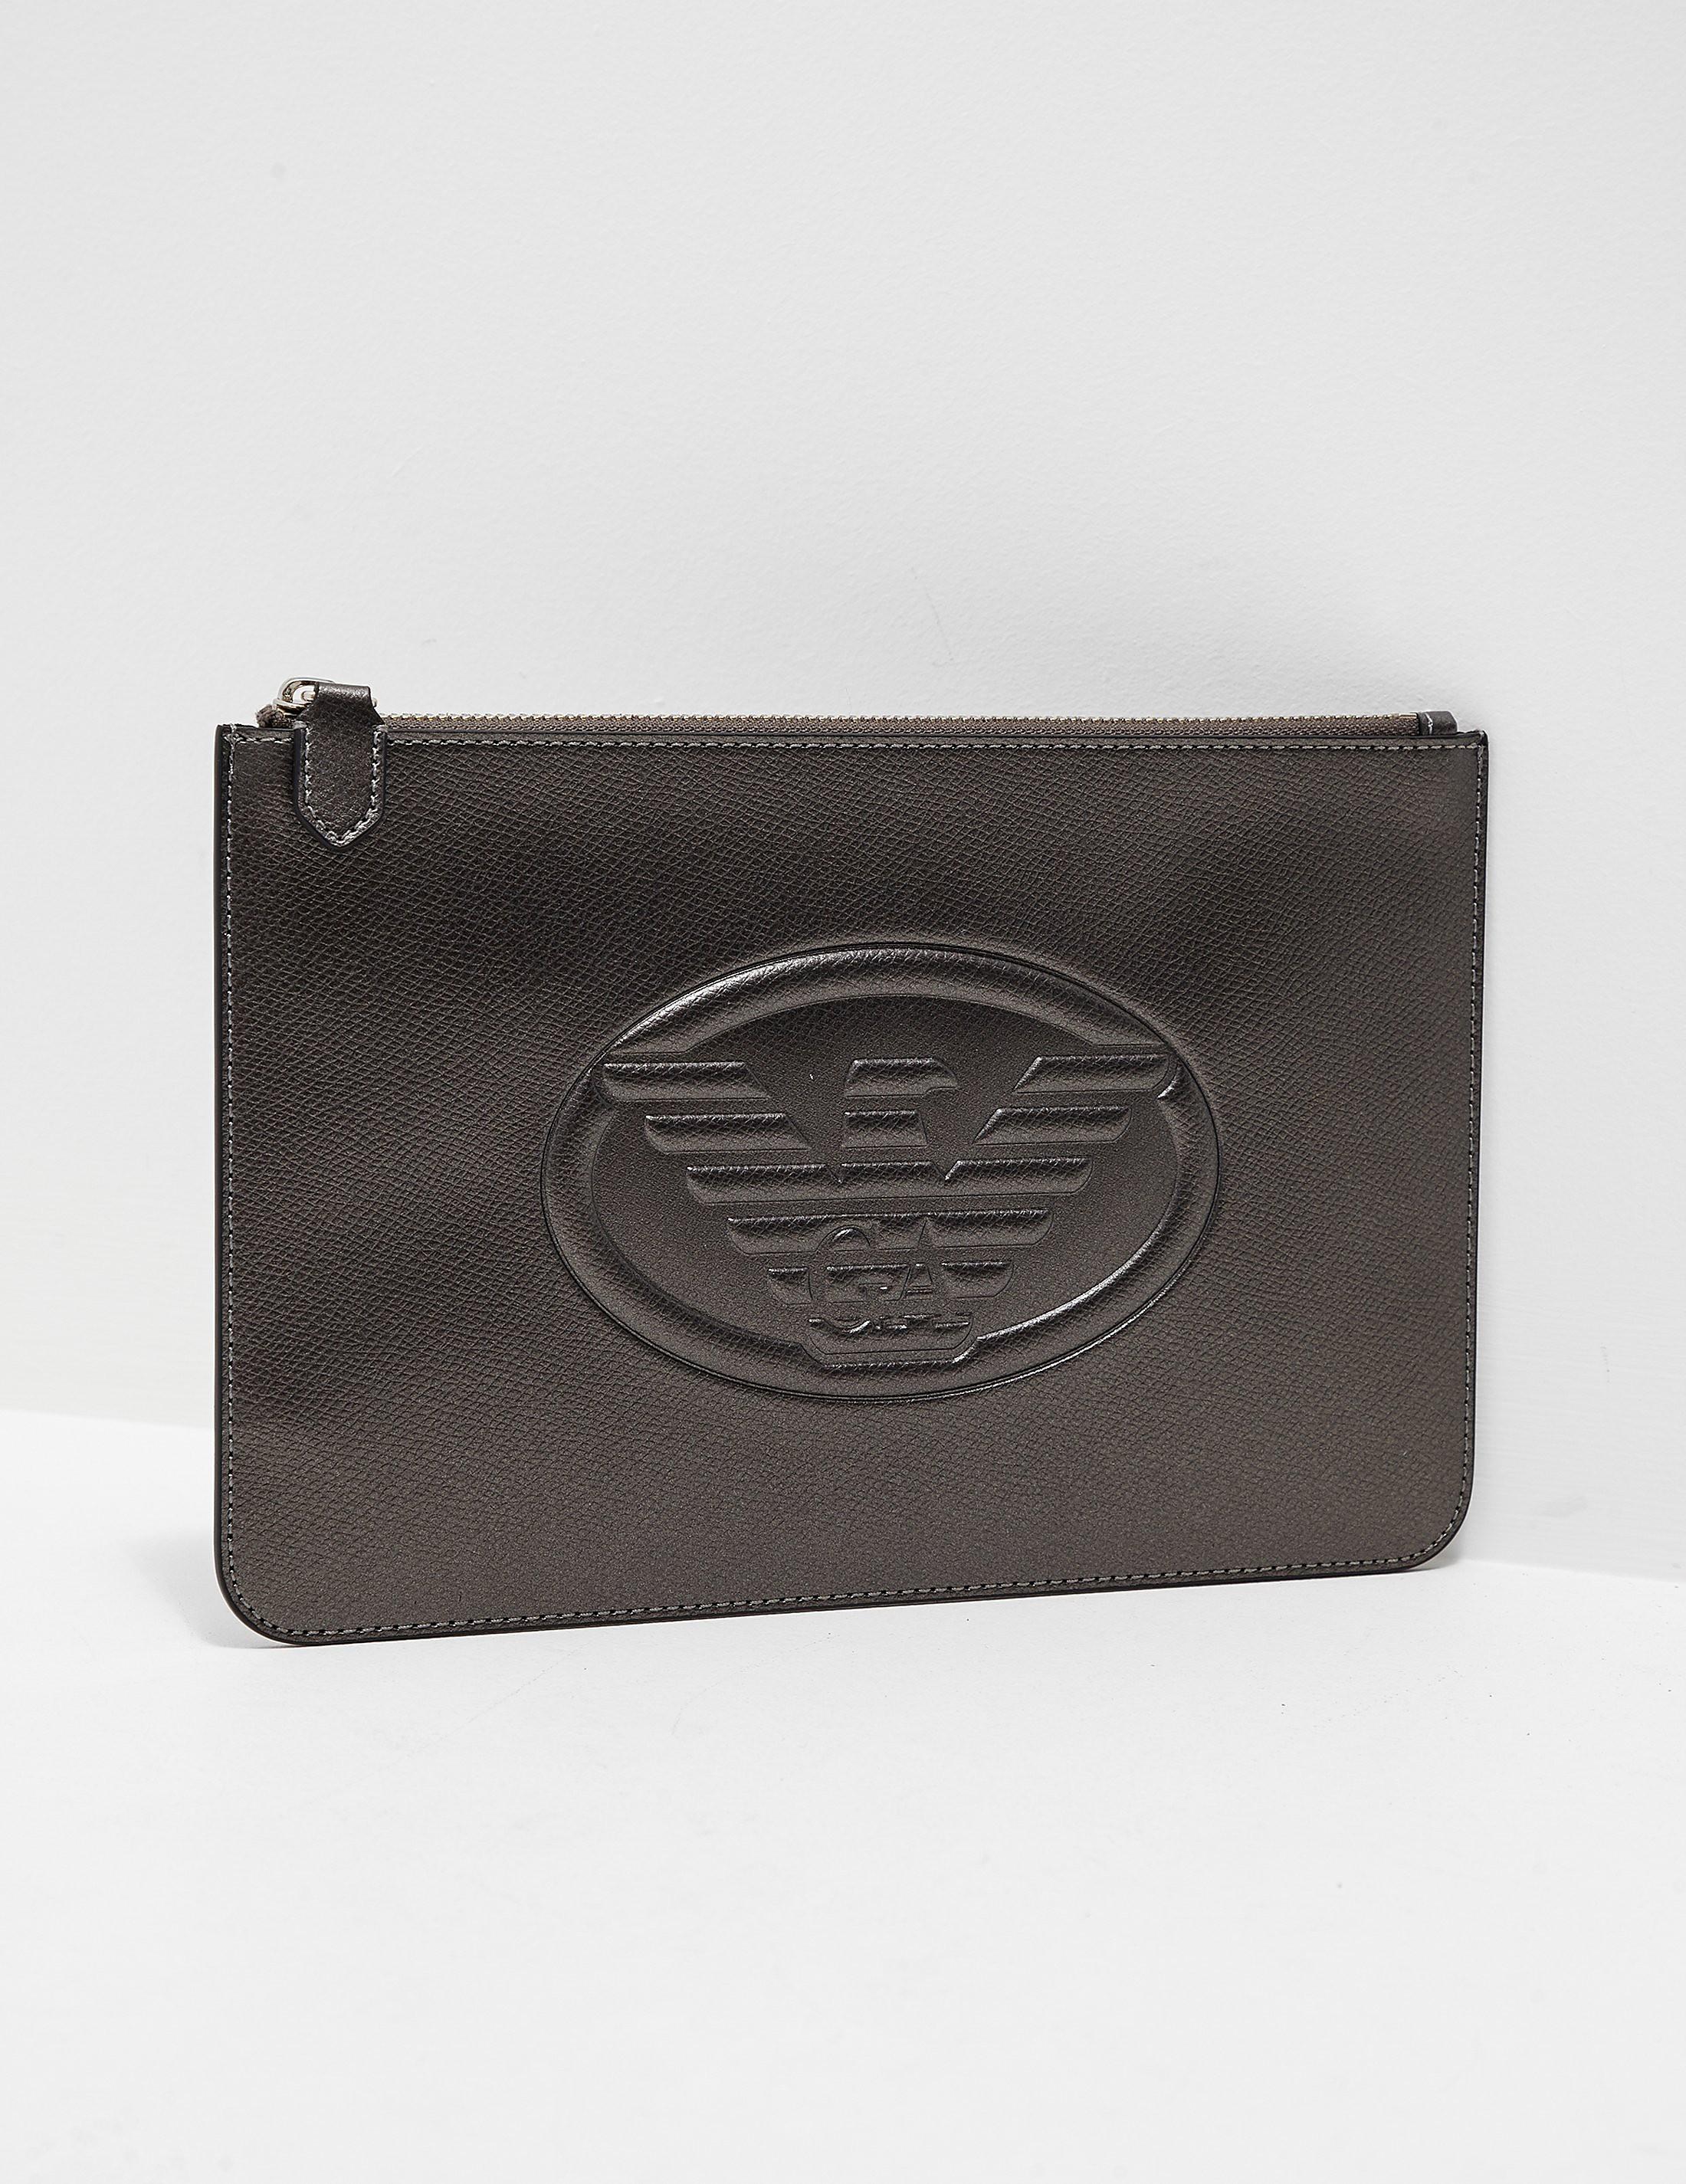 Emporio Armani Logo Clutch Bag